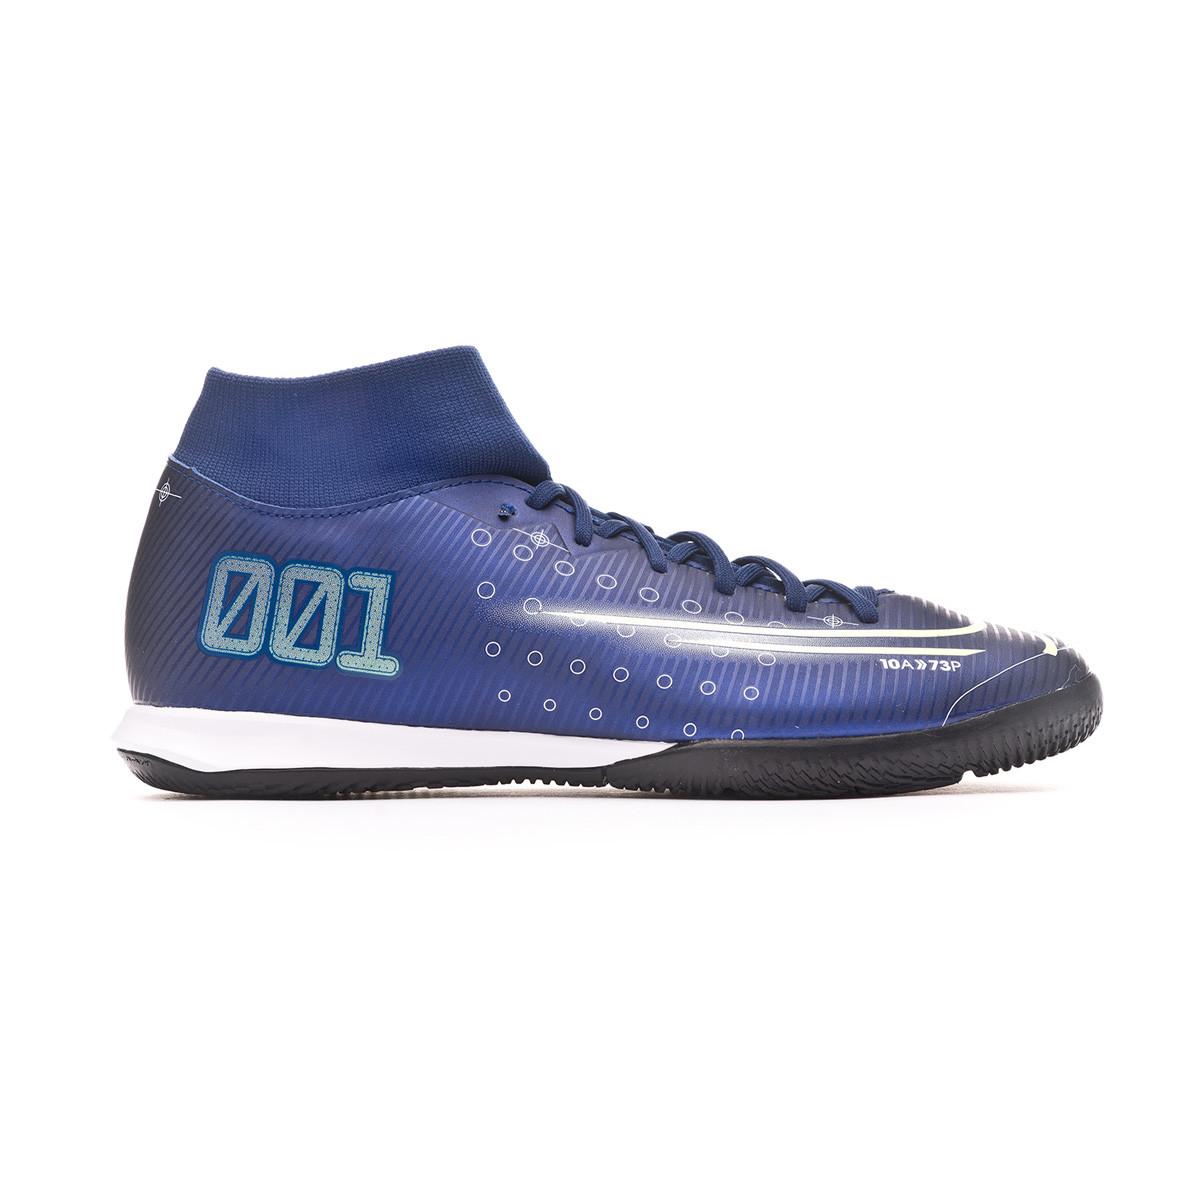 Chaussure de futsal Nike Mercurial Superfly VII Academy MDS IC